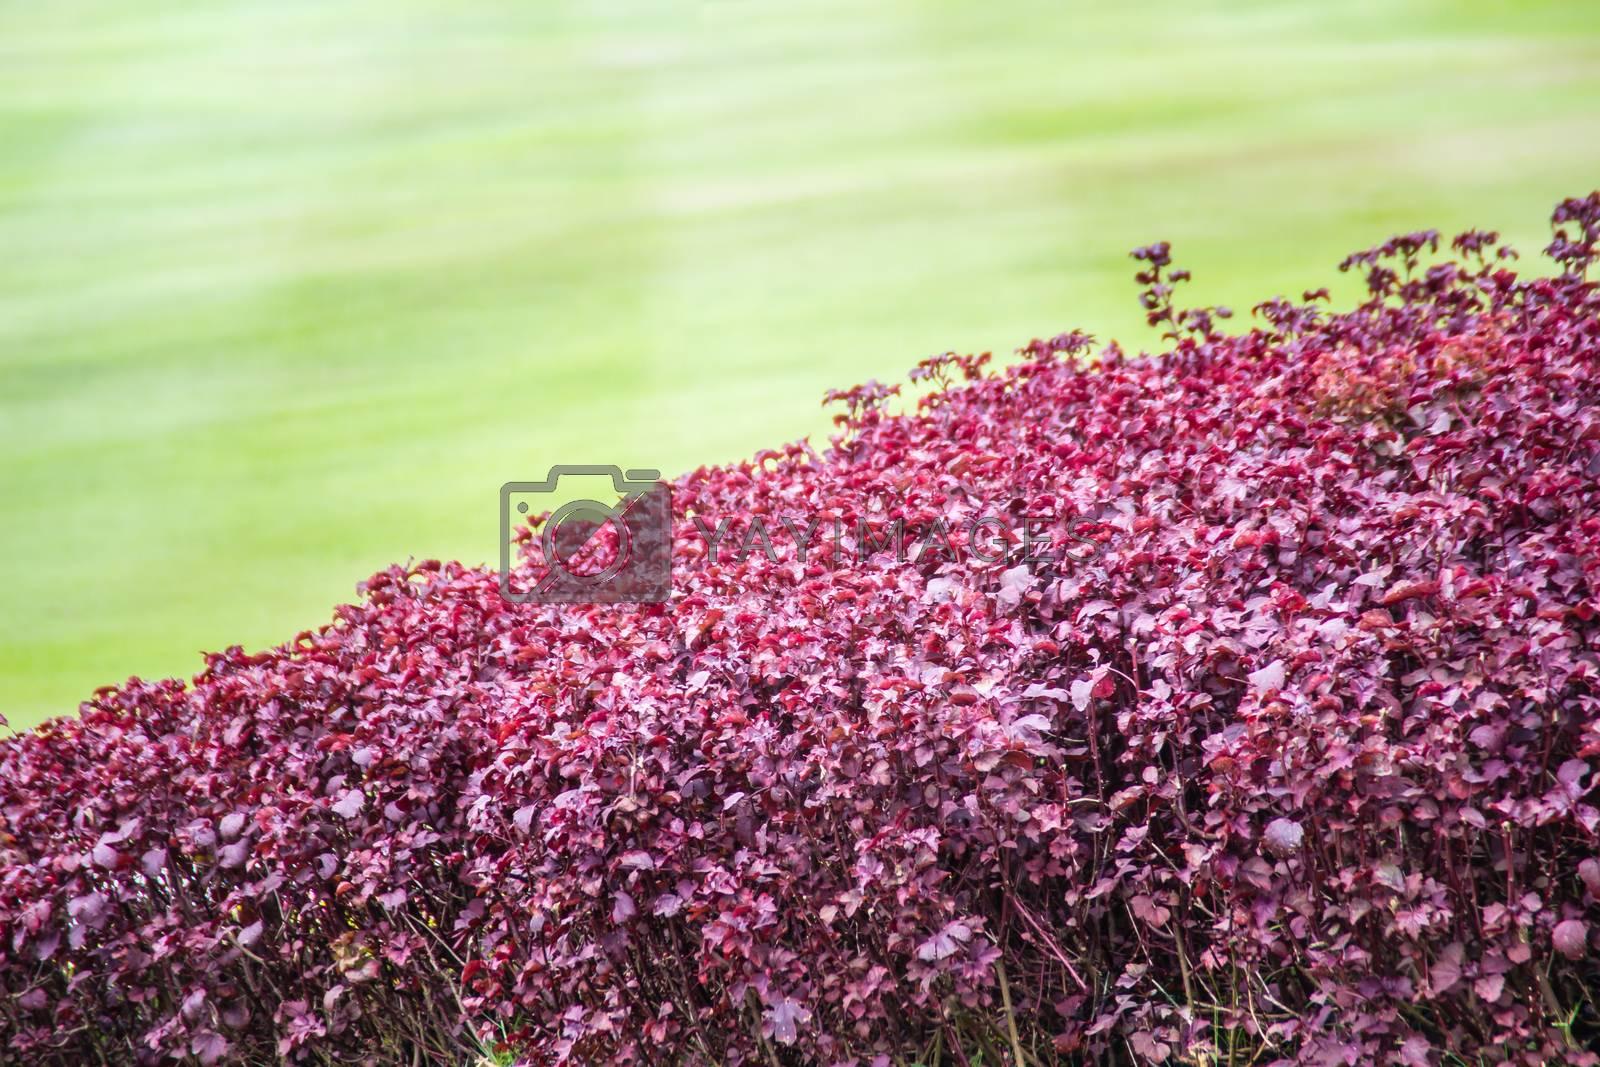 Beautiful purple leaves of Aerva sanguinolenta with green grass on background.